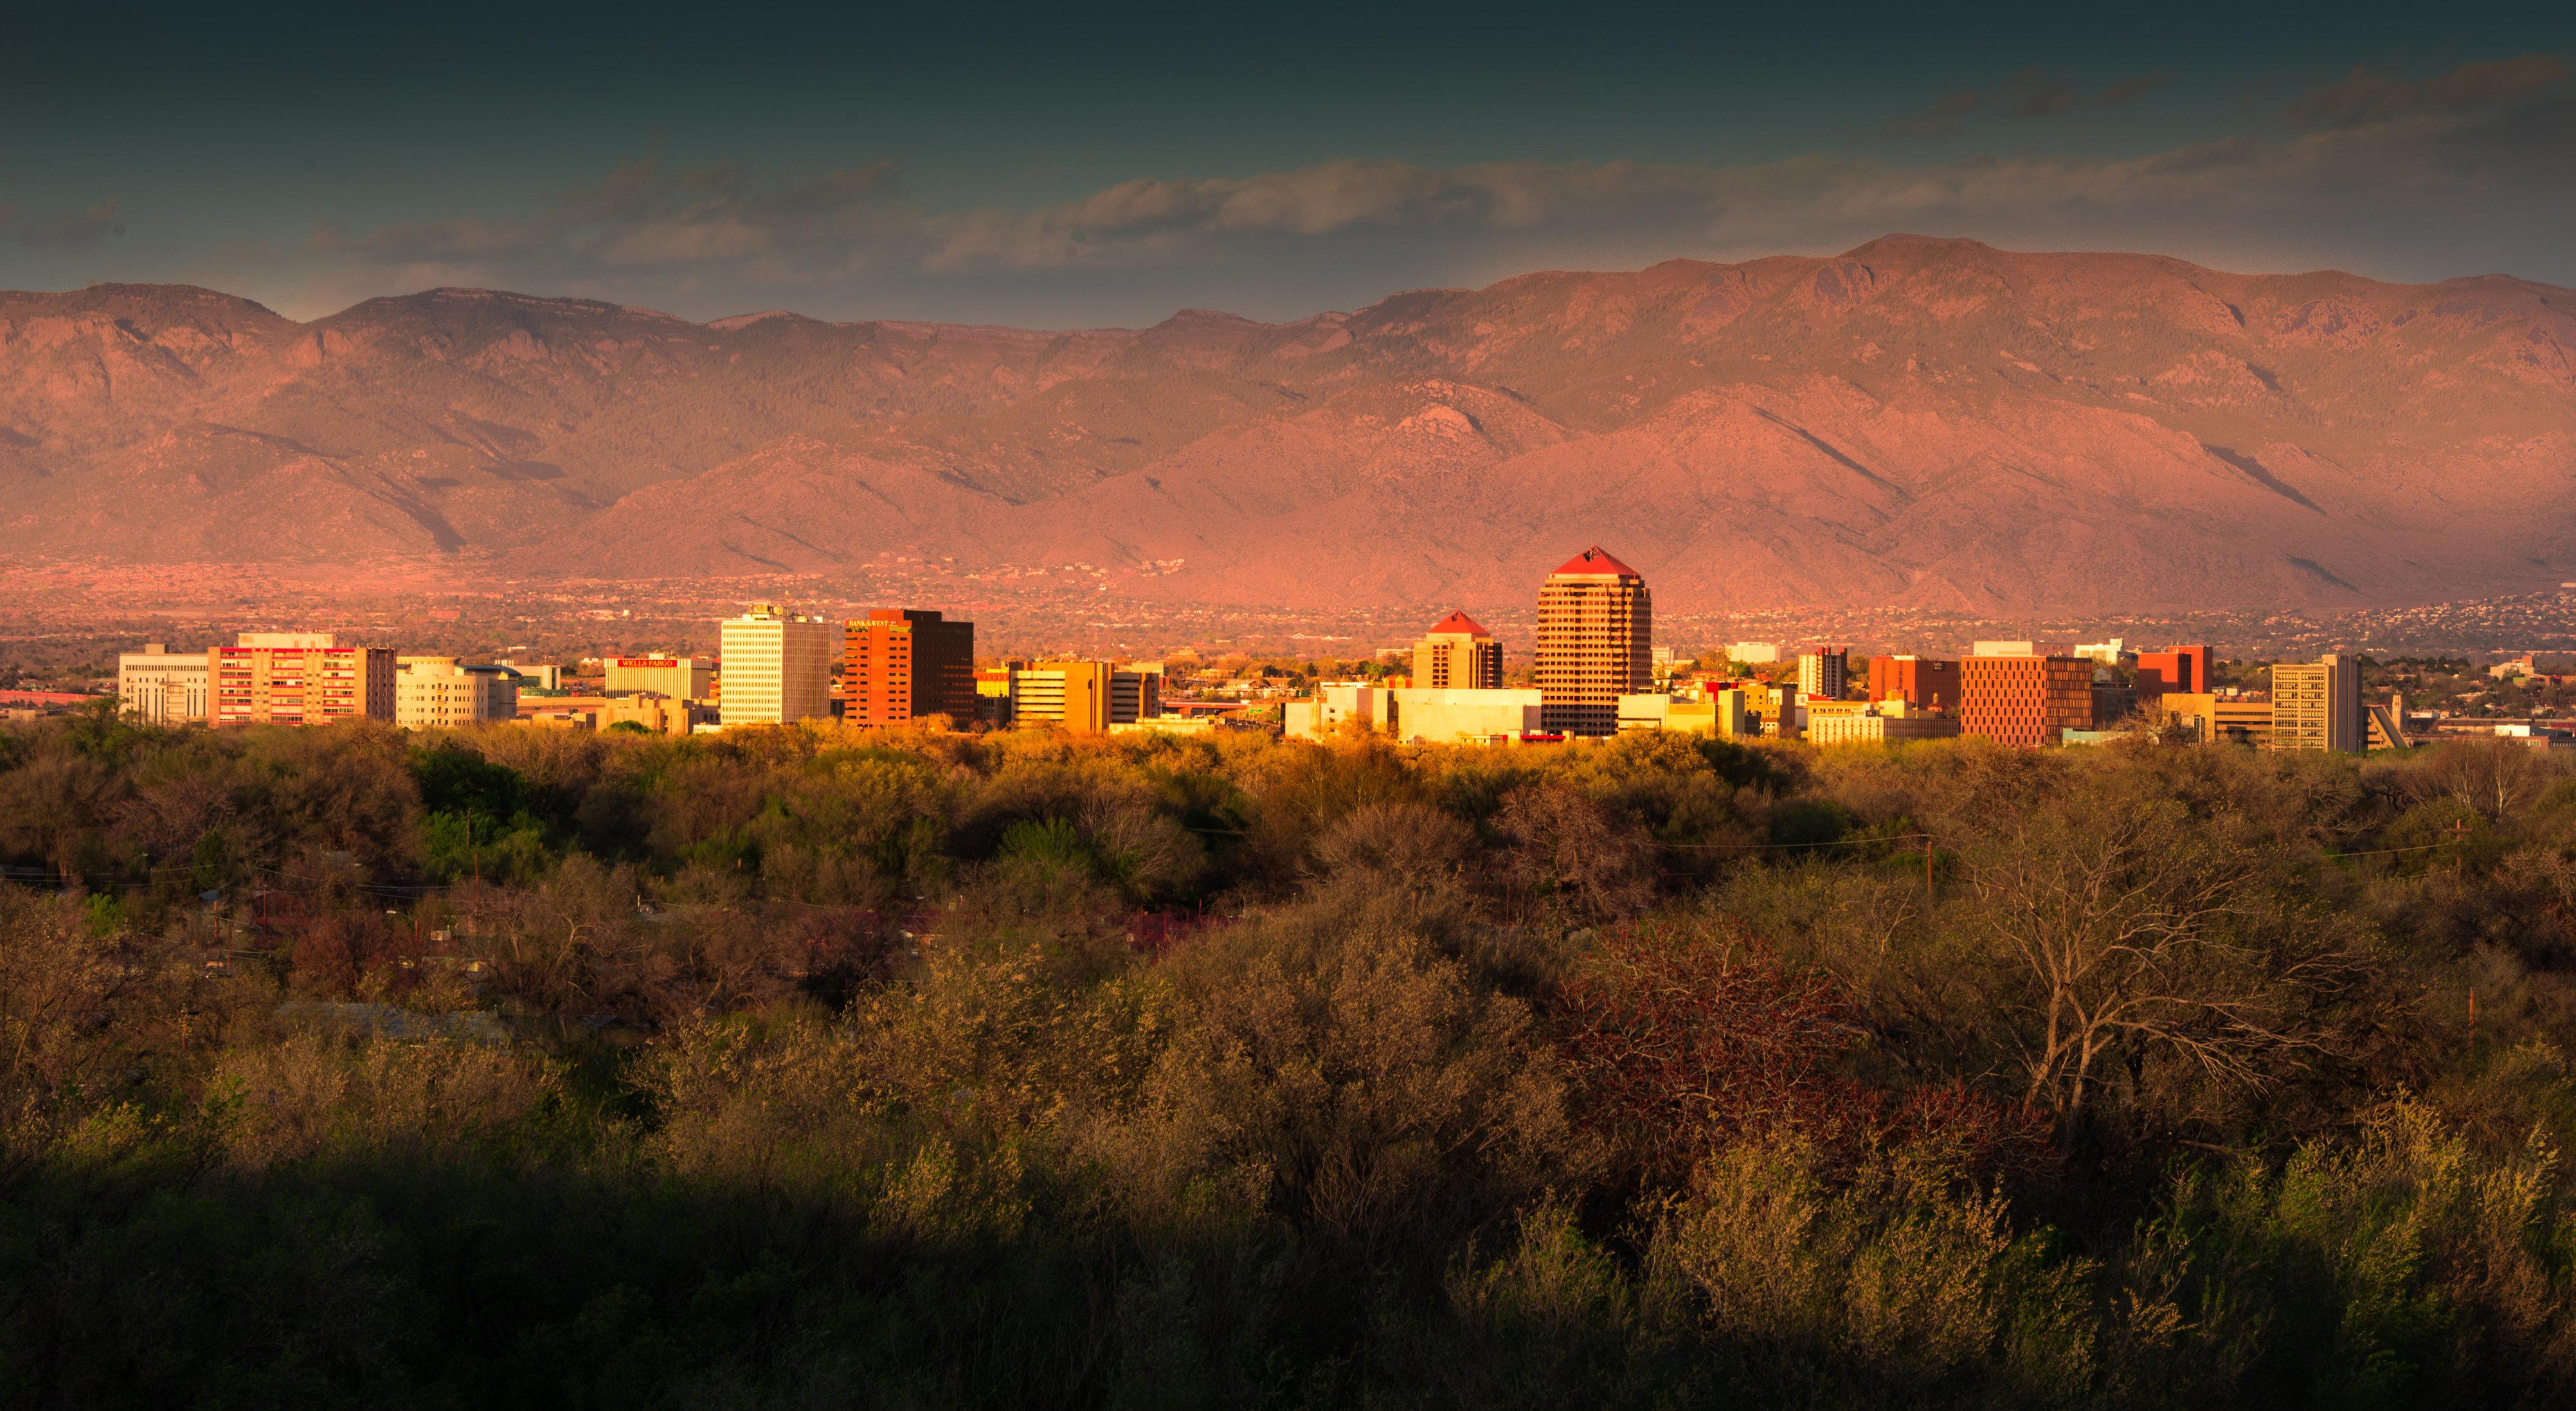 Albuquerque skyline at sunset, downtown buildings, Sandia Peak in background.